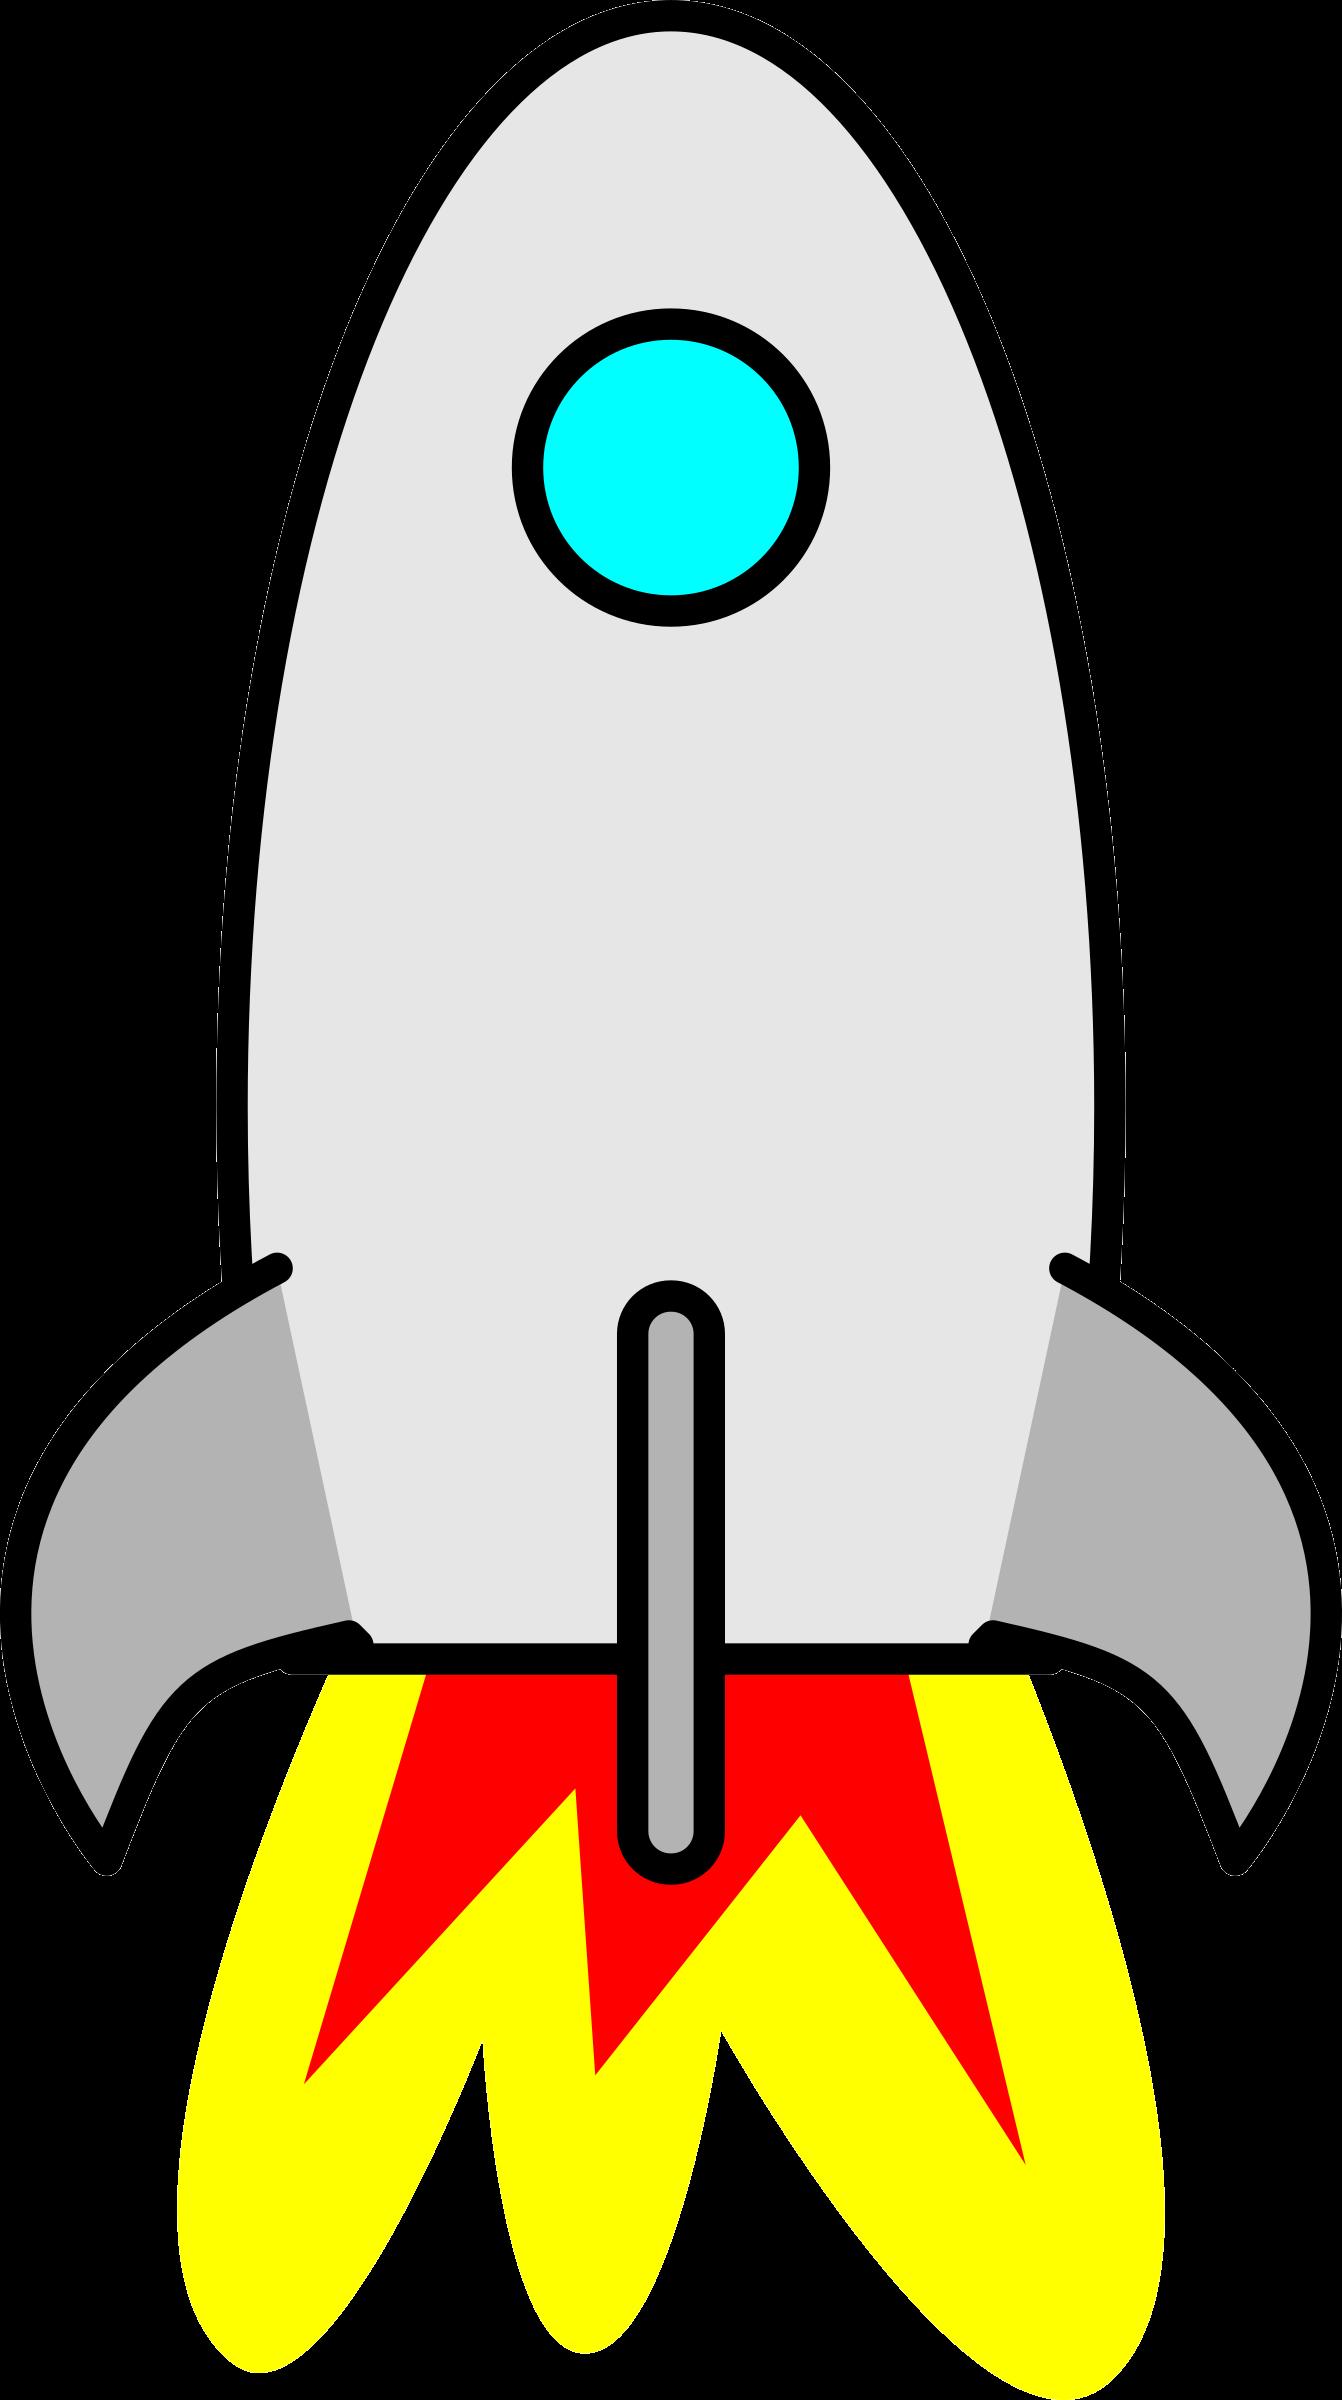 Clipart rocket gambar. Ship log free on